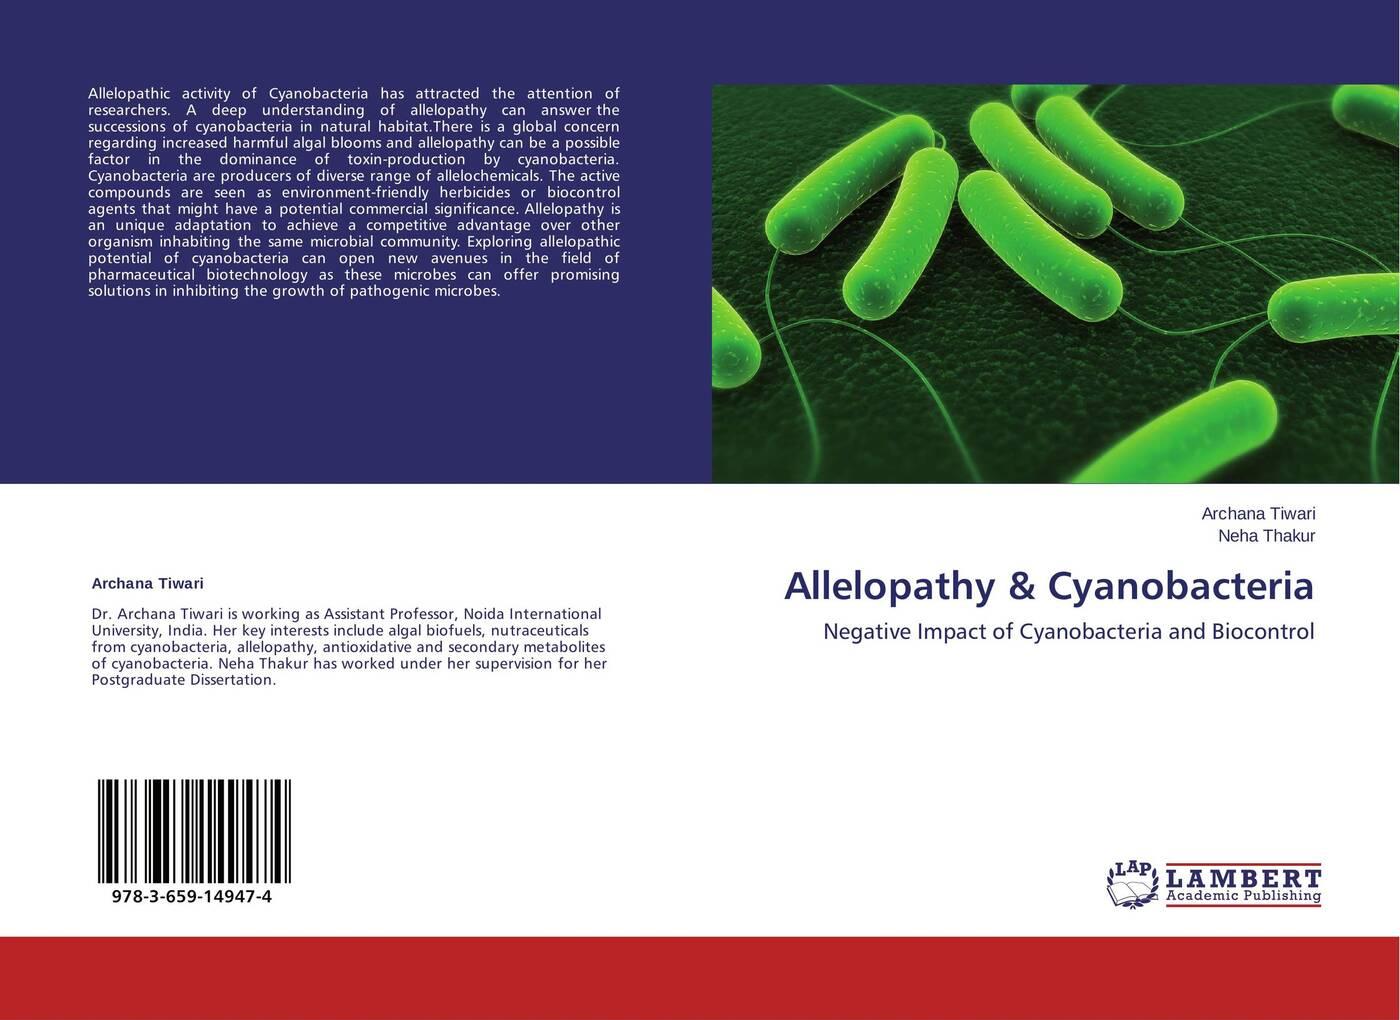 Archana Tiwari and Neha Thakur Allelopathy & Cyanobacteria